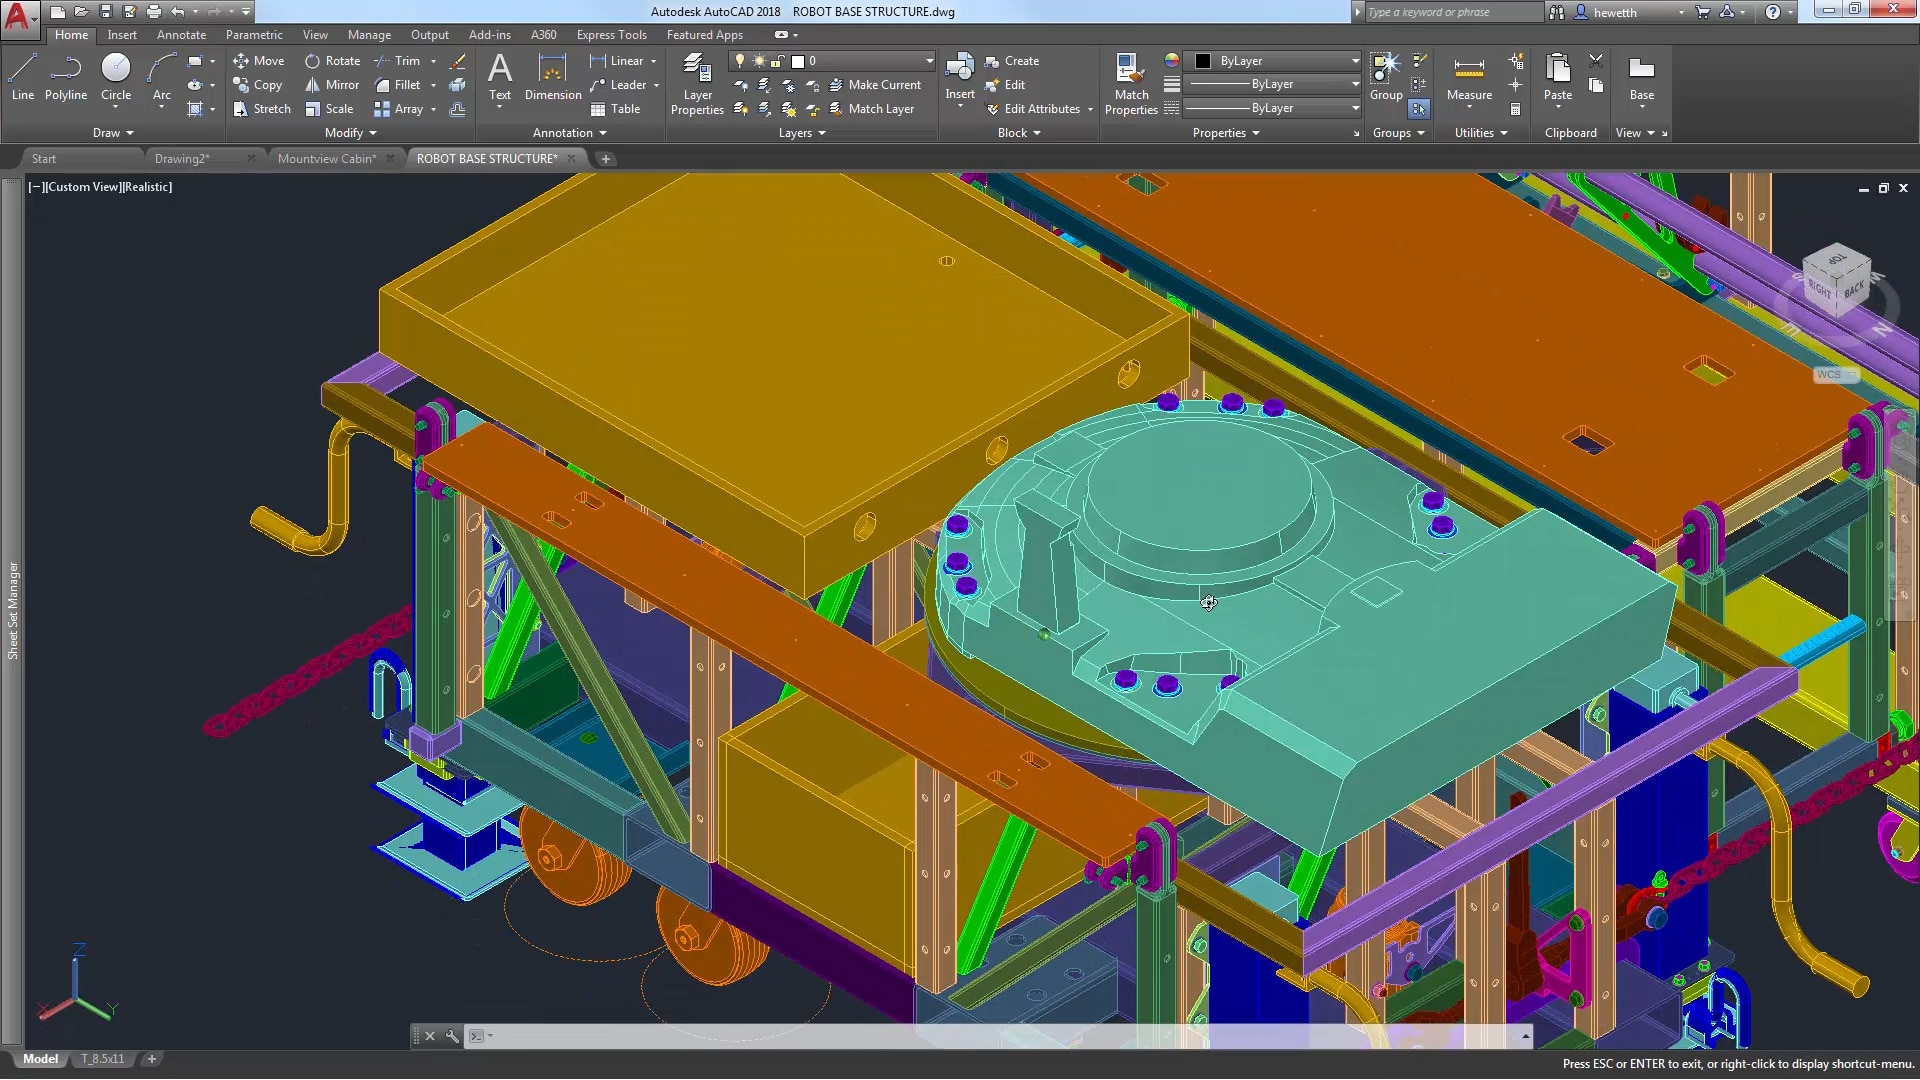 Download Maya Free Trial | Maya 2019 | Autodesk